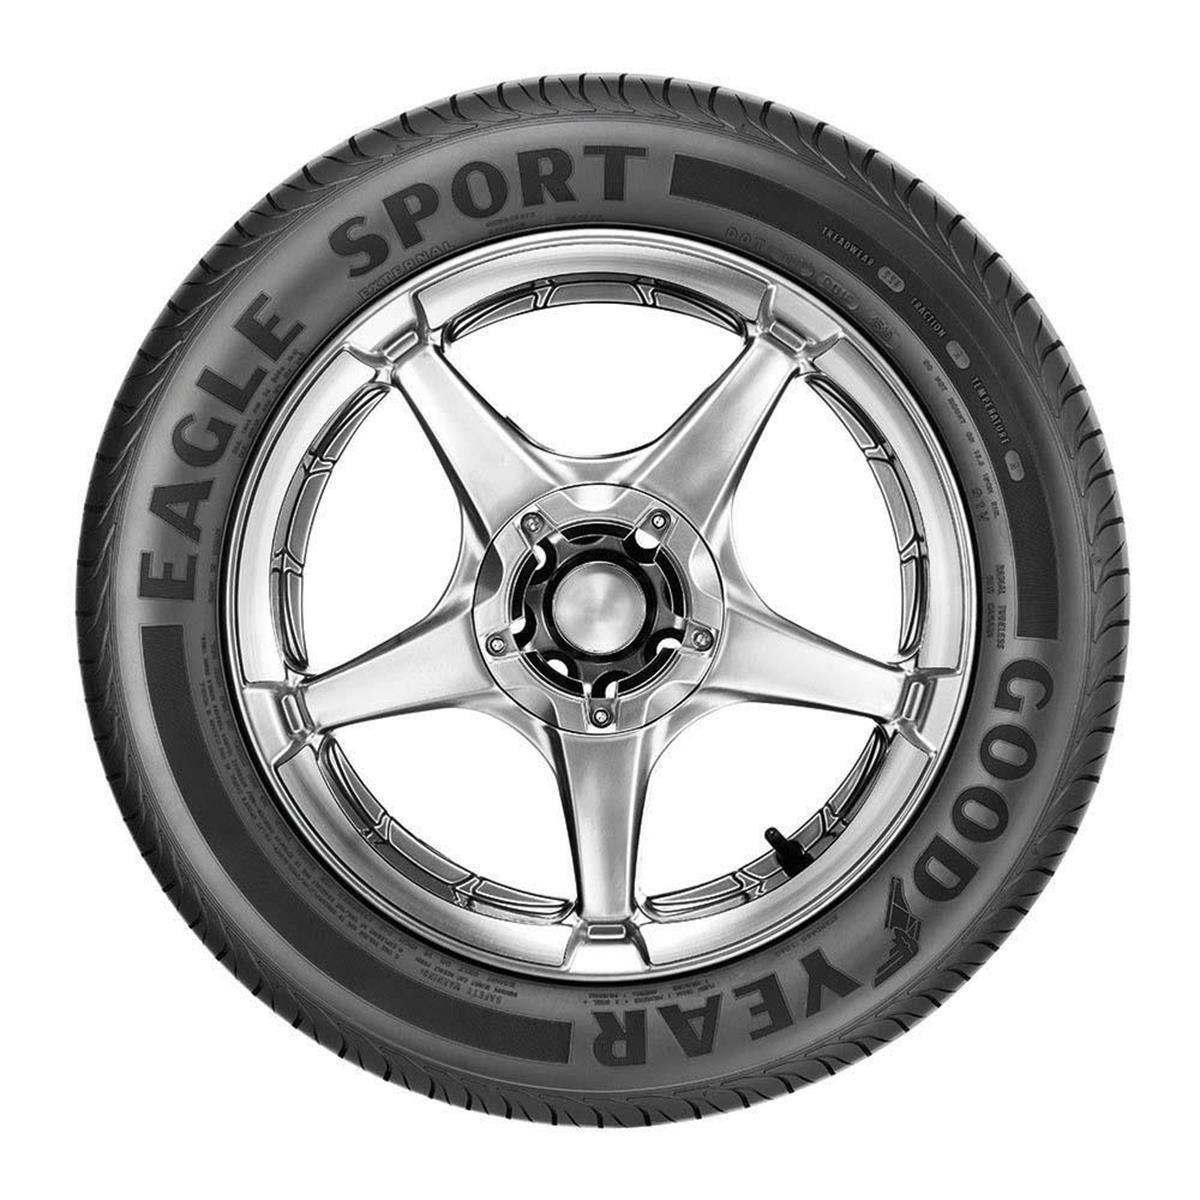 Pneu 185/65 R 15 - Eagle Sport 88h - Goodyear